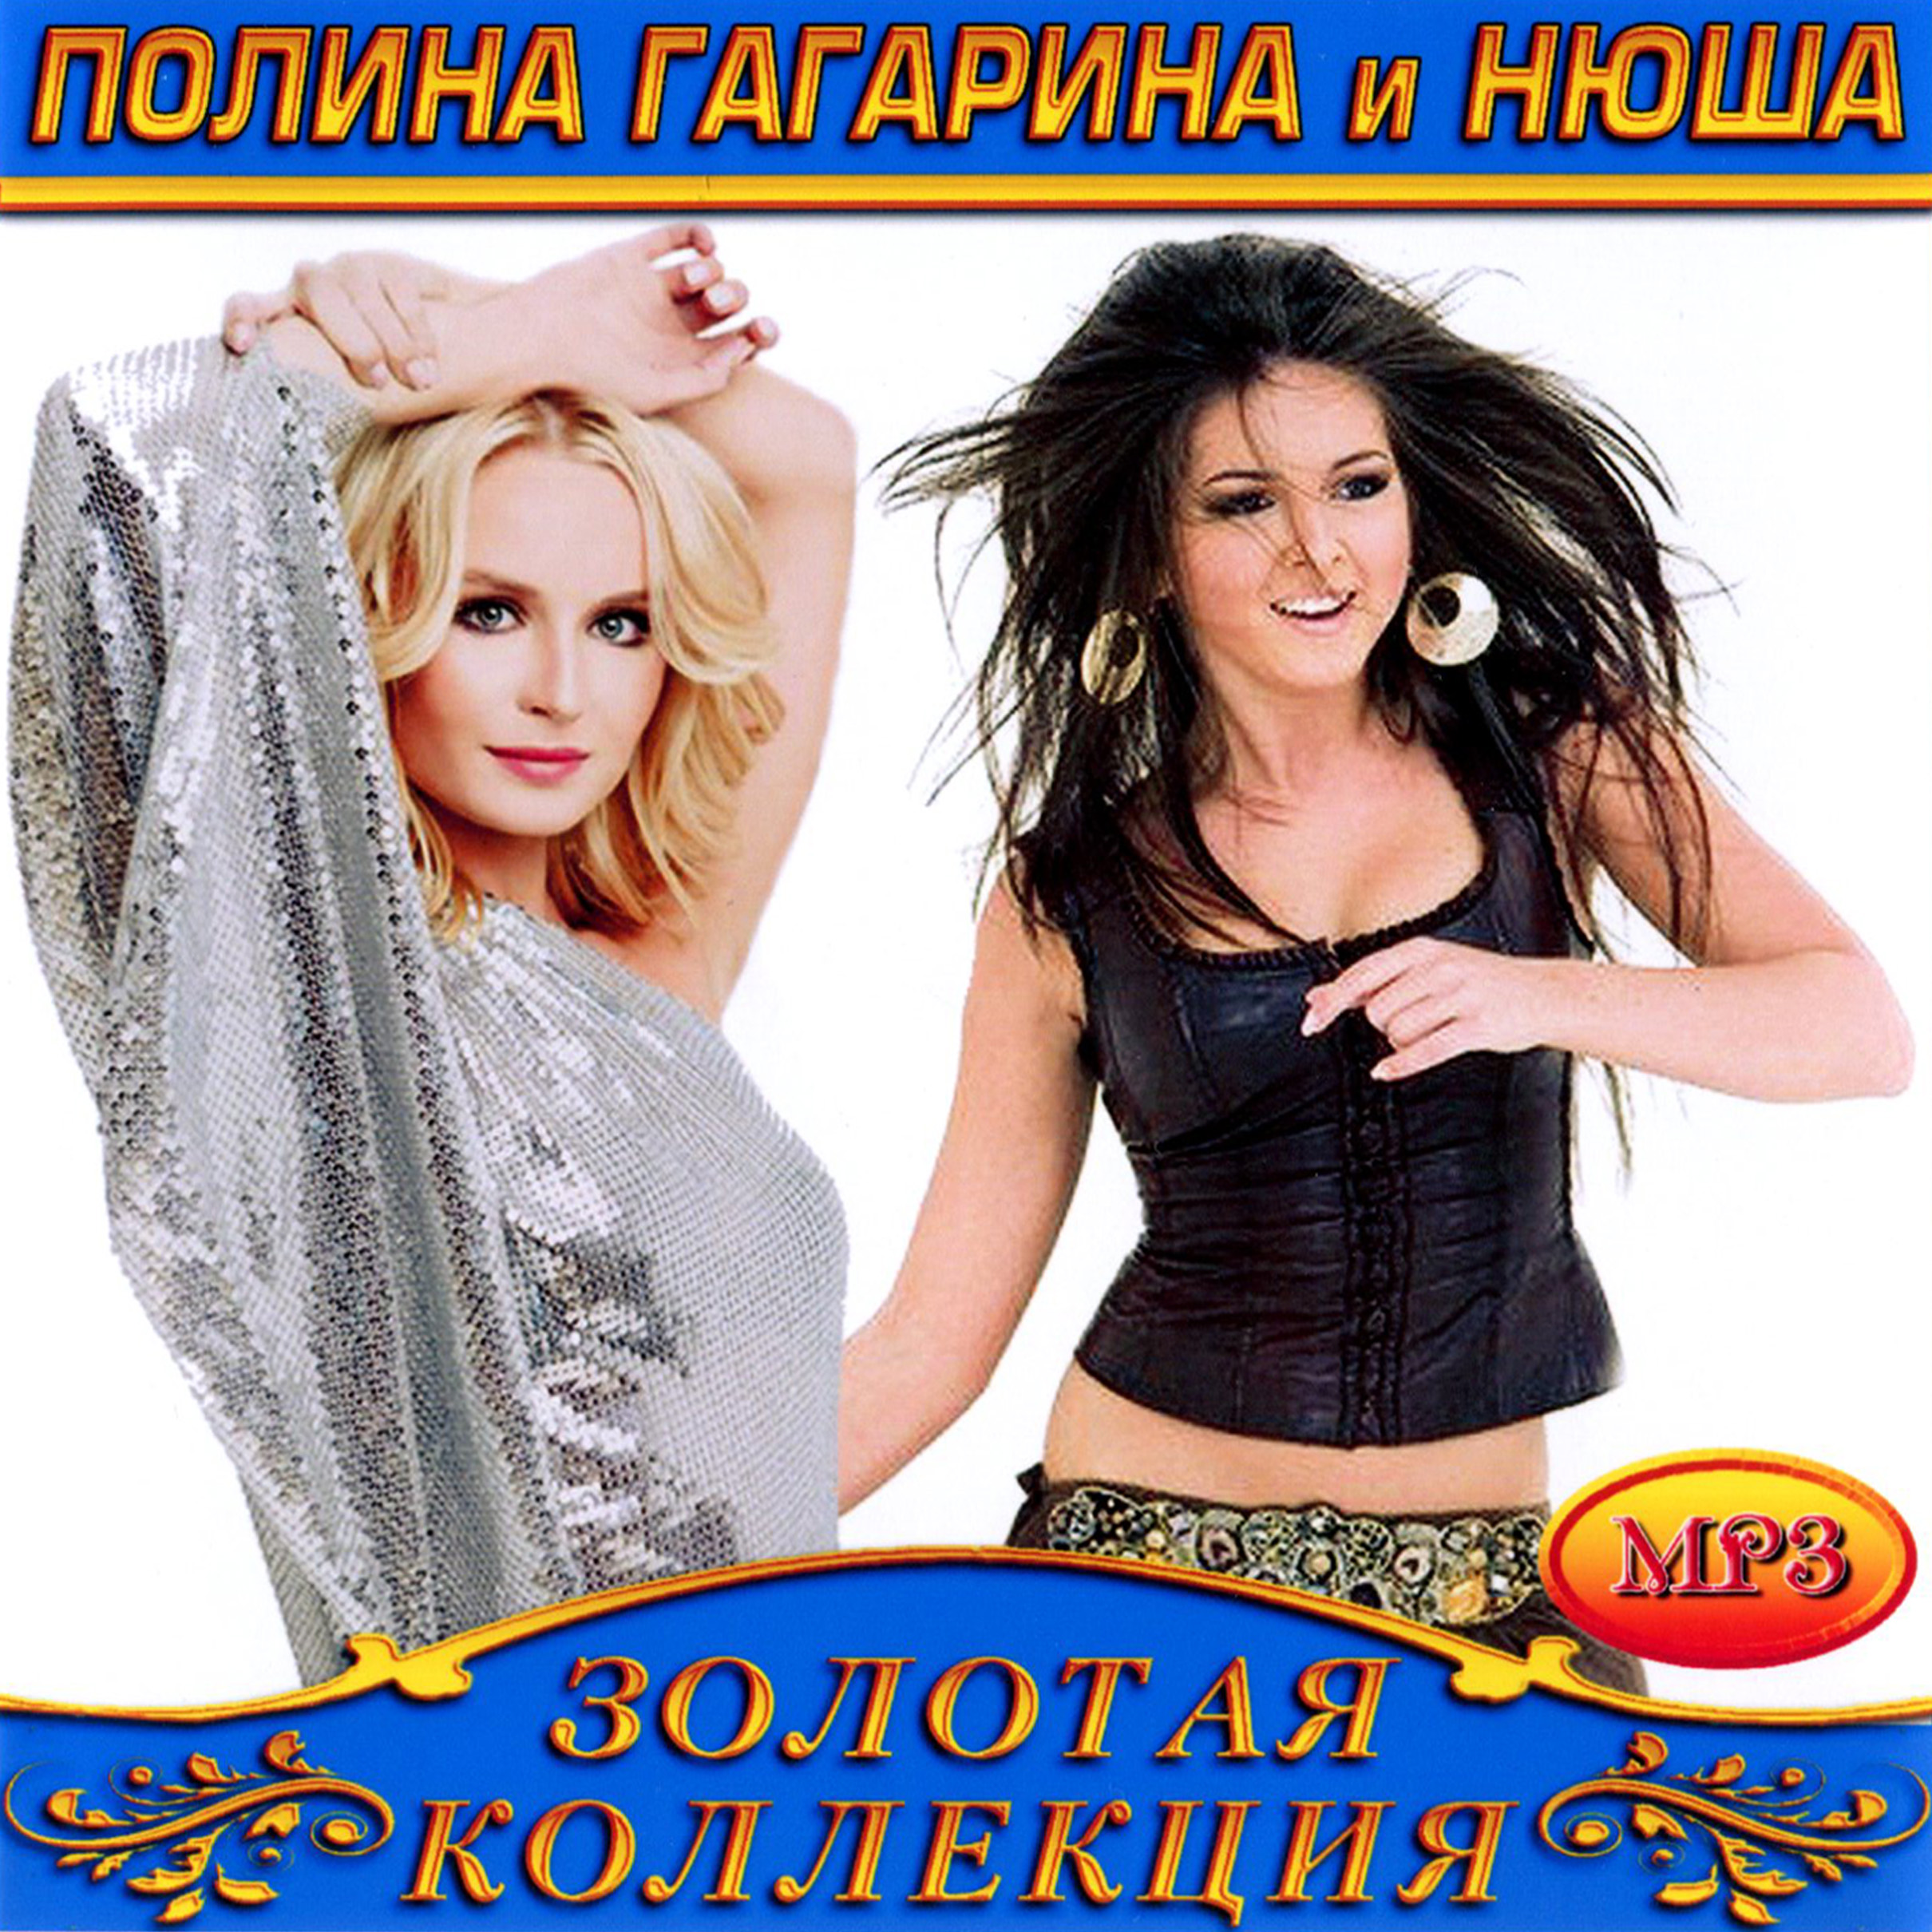 Полина Гагарина & Нюша [mp3]